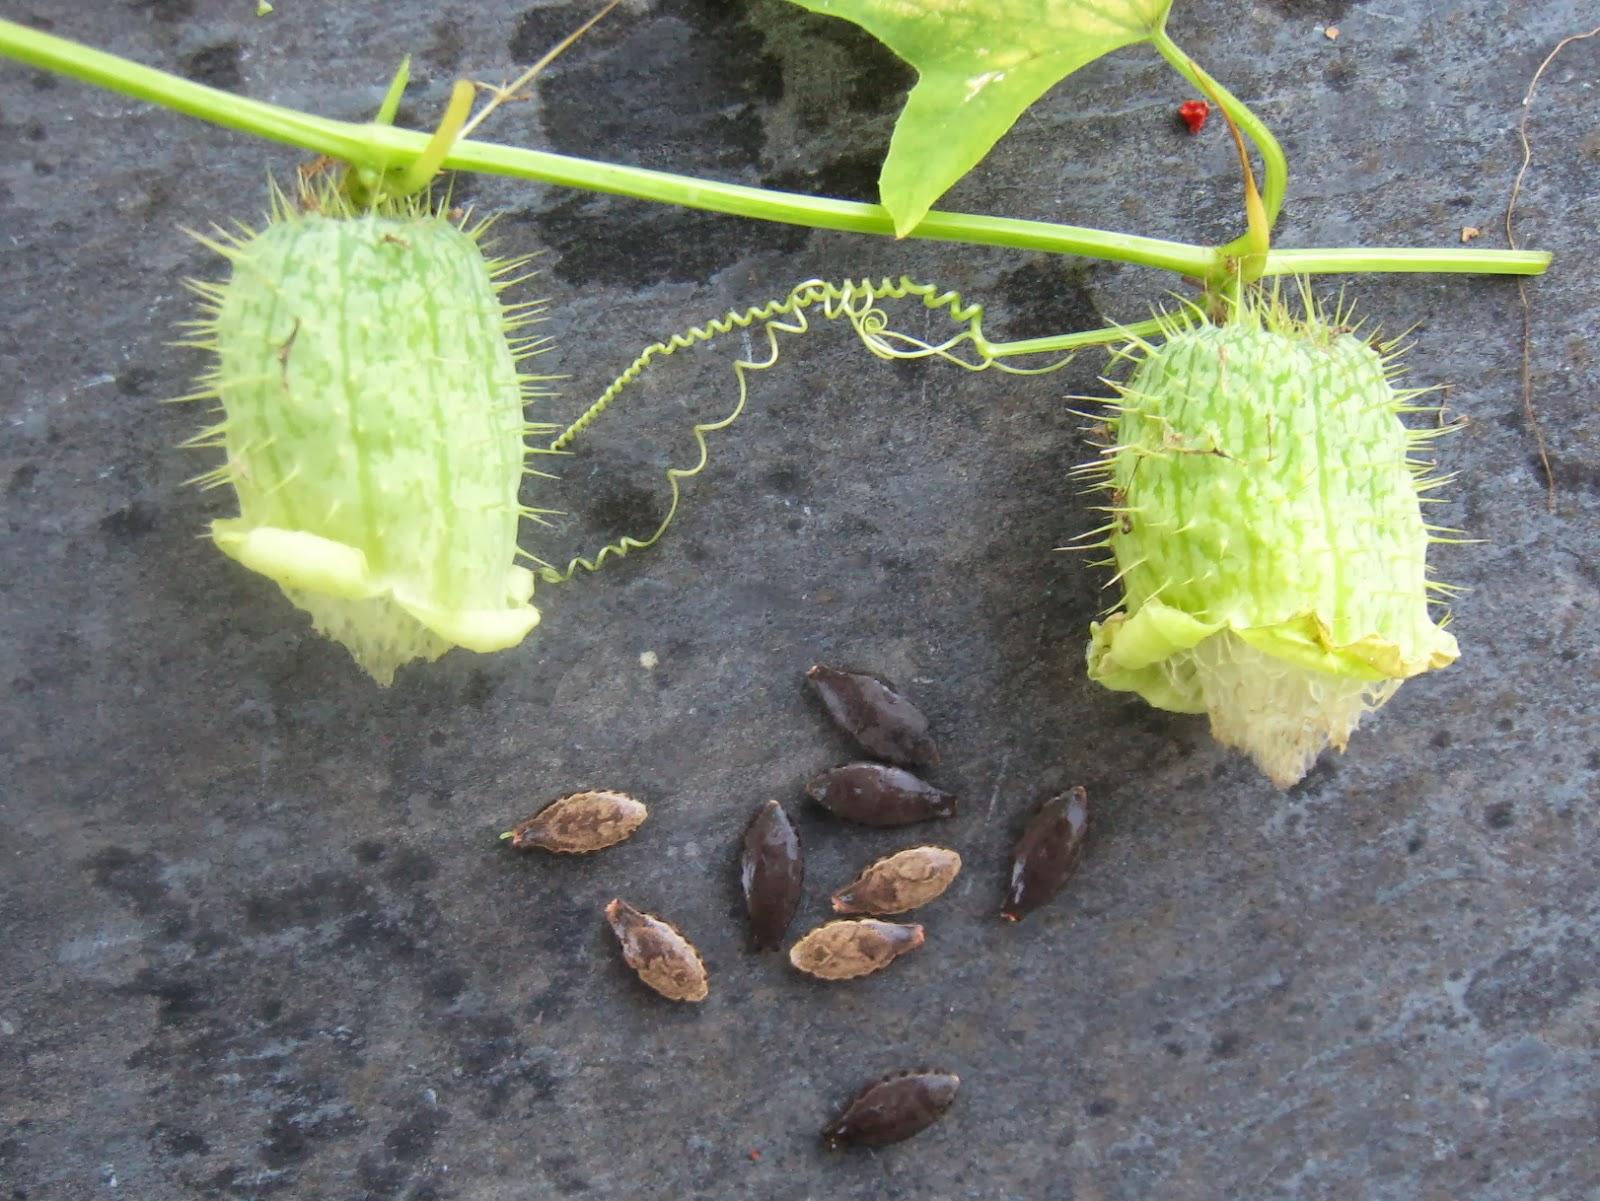 maynard life outdoors and hidden history of maynard wild cucumber annoying native plant